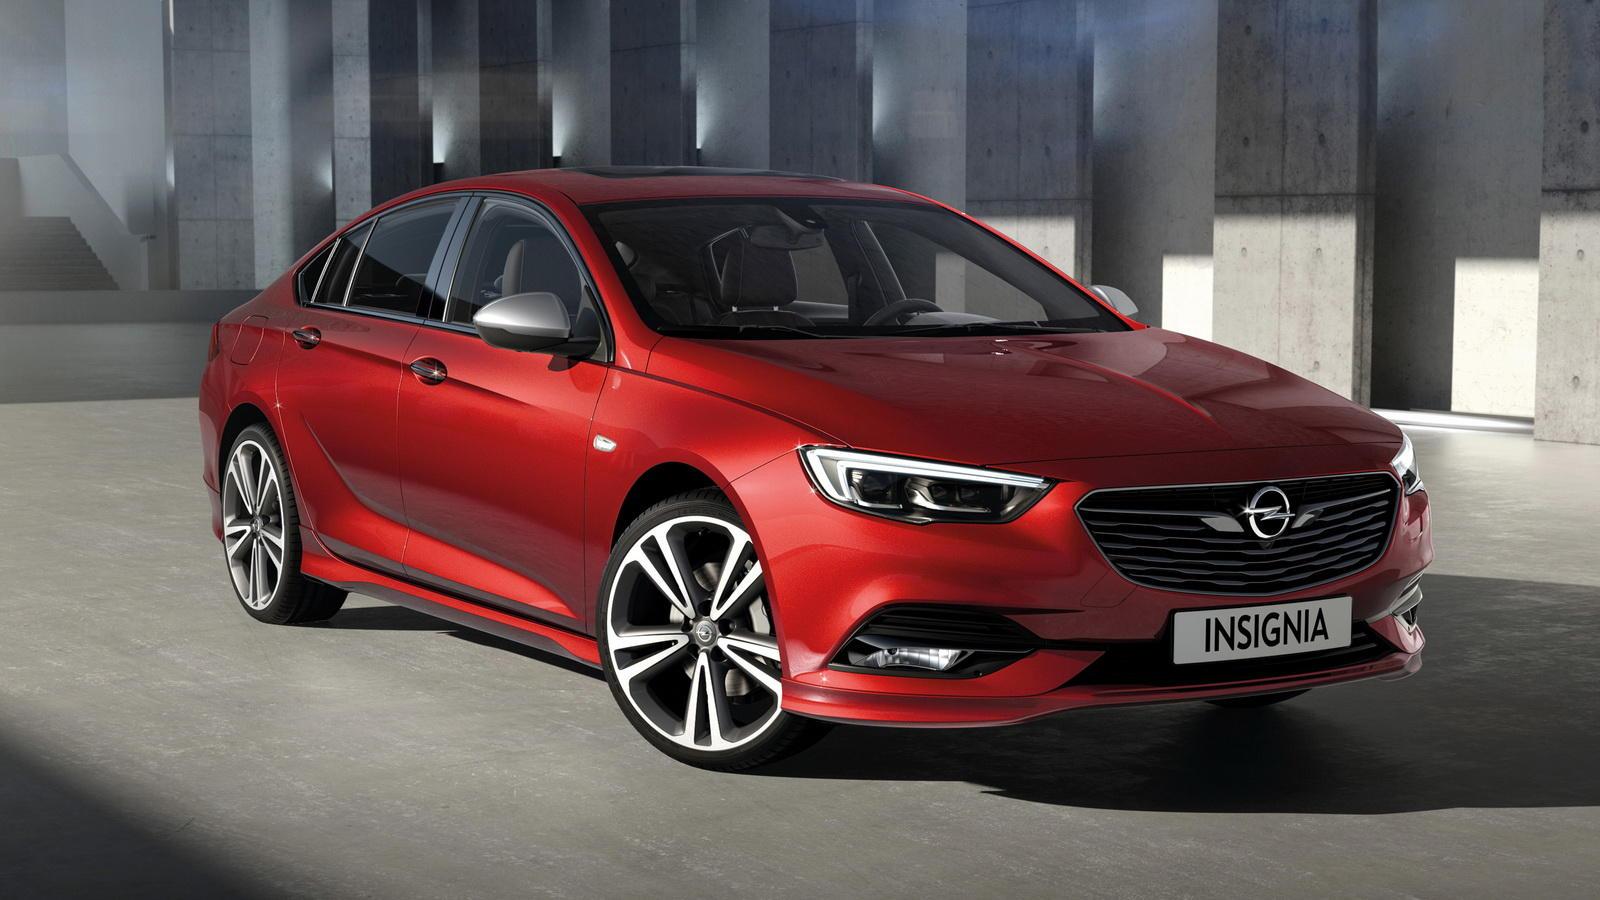 Opel Insignia Exclusive - Opel Insignia Exclusive